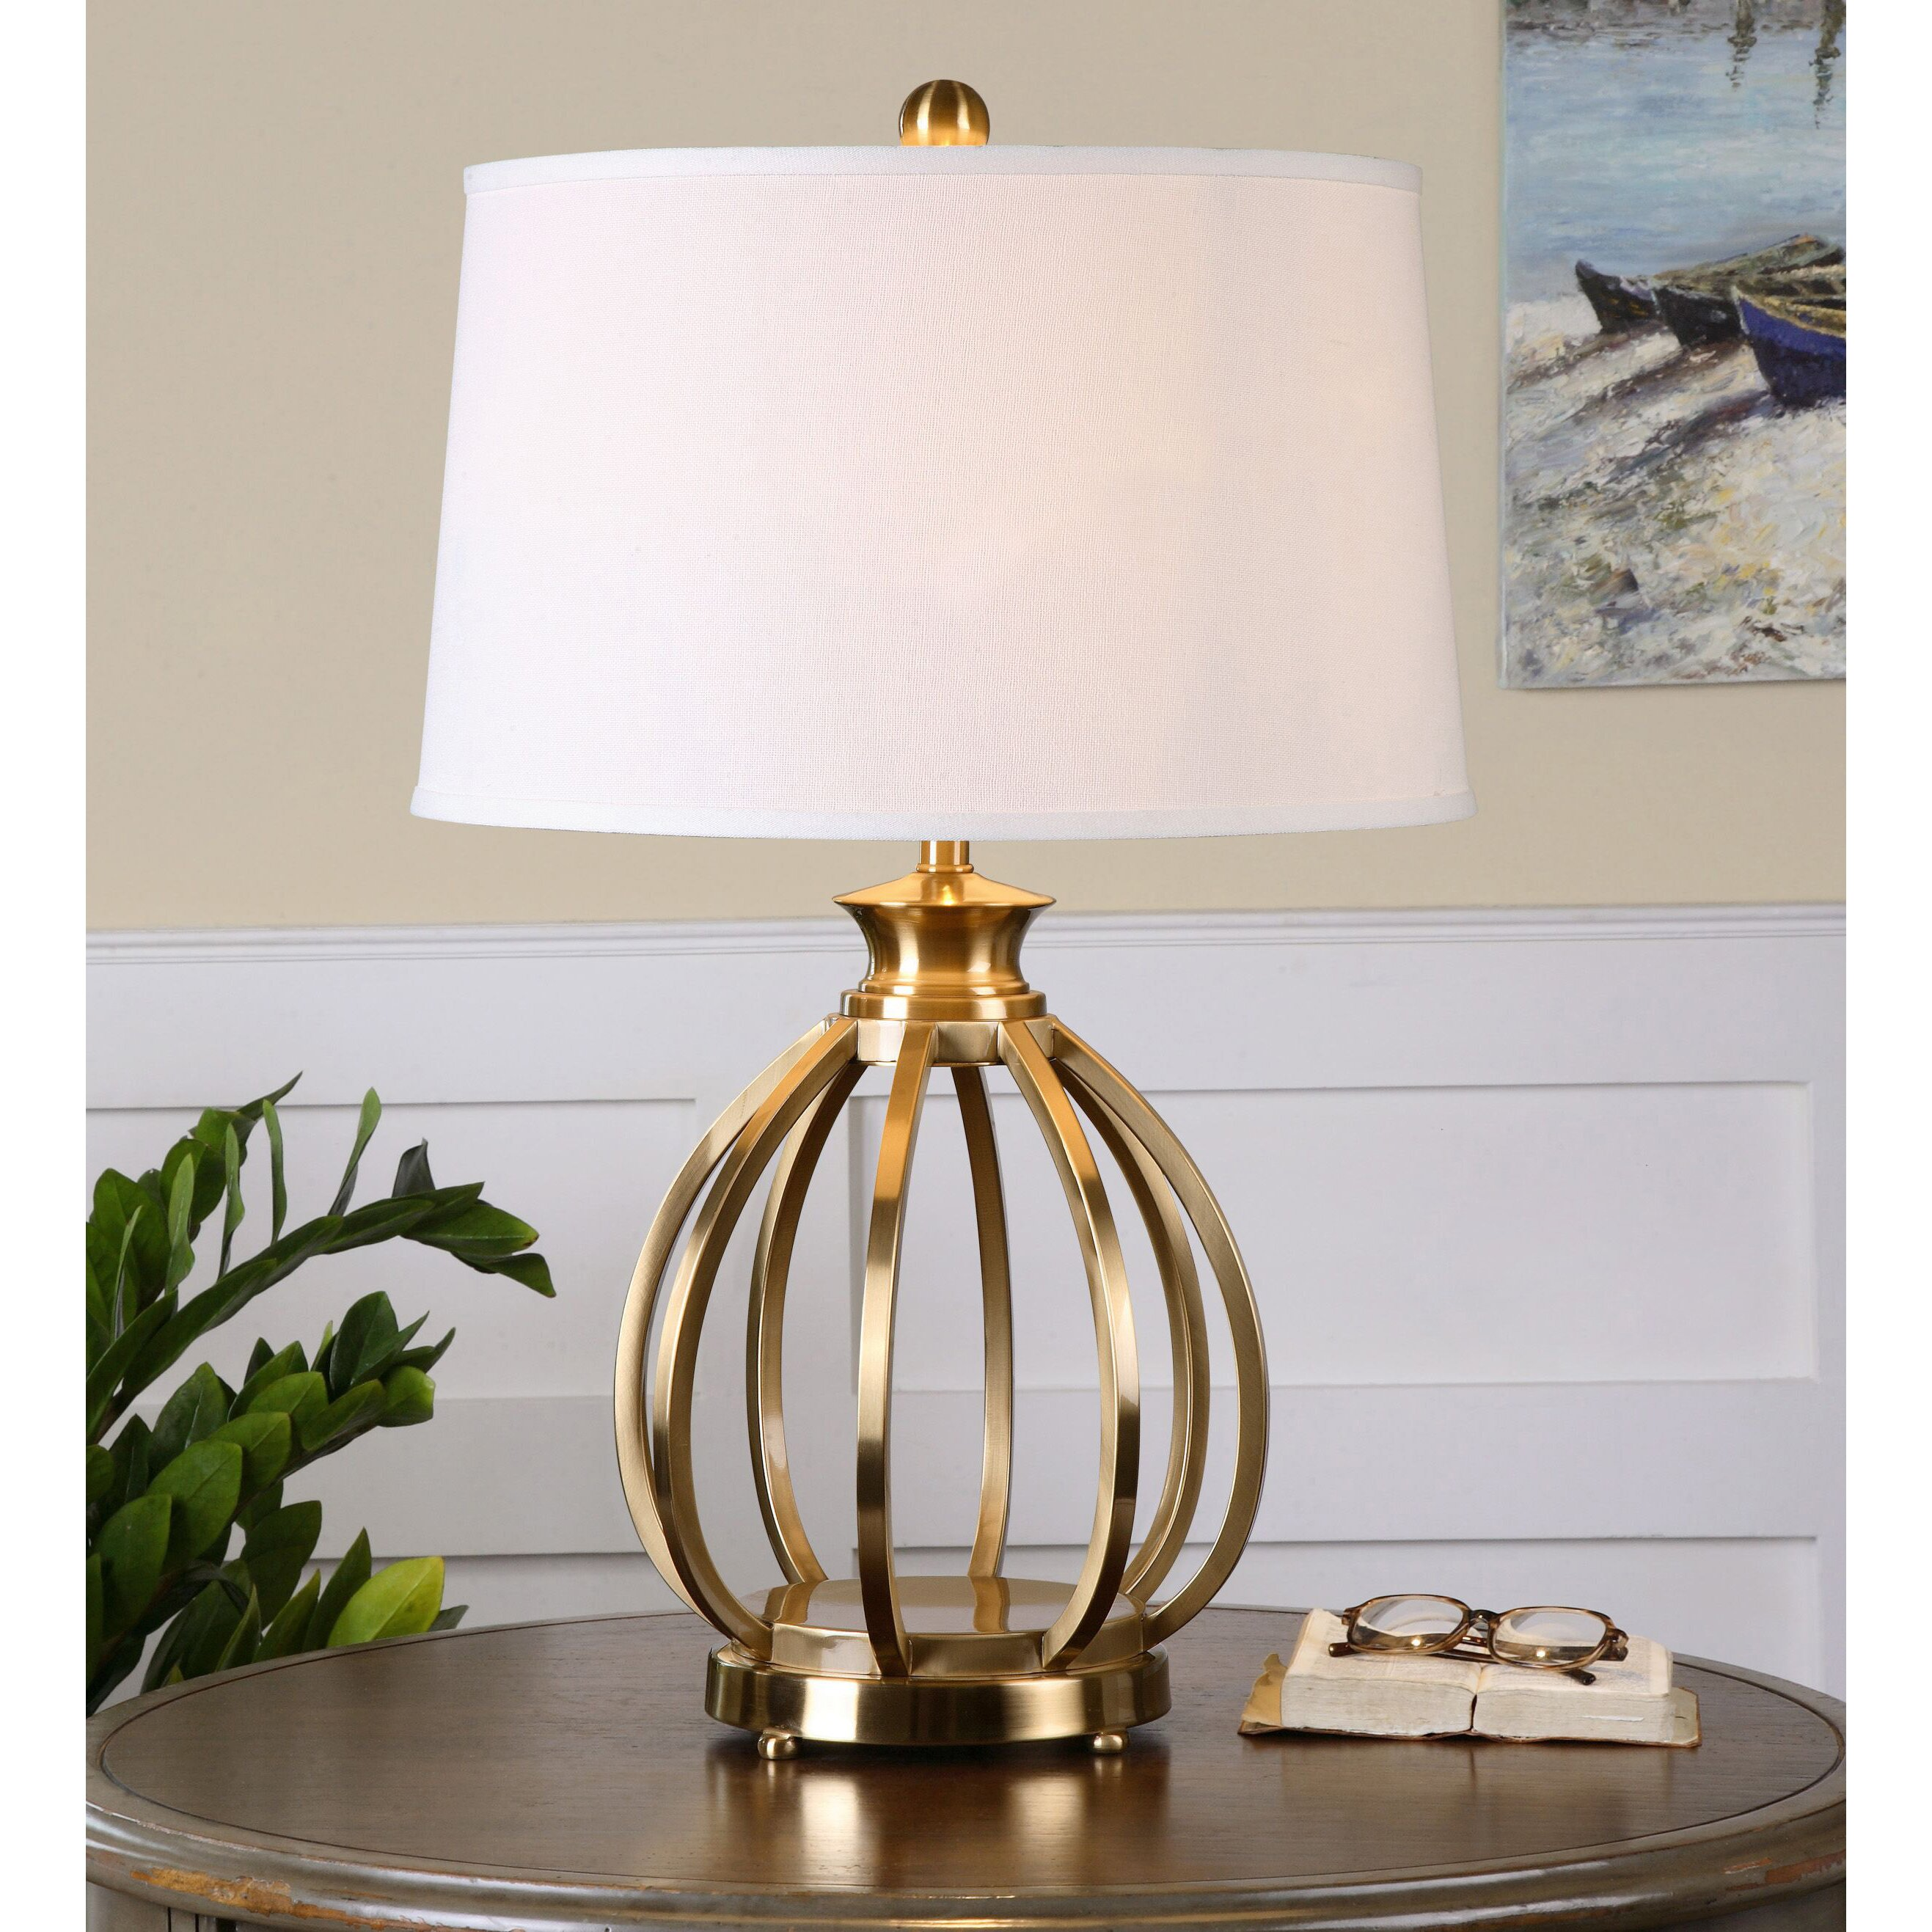 uttermost decimus 28 table lamp reviews wayfair. Black Bedroom Furniture Sets. Home Design Ideas